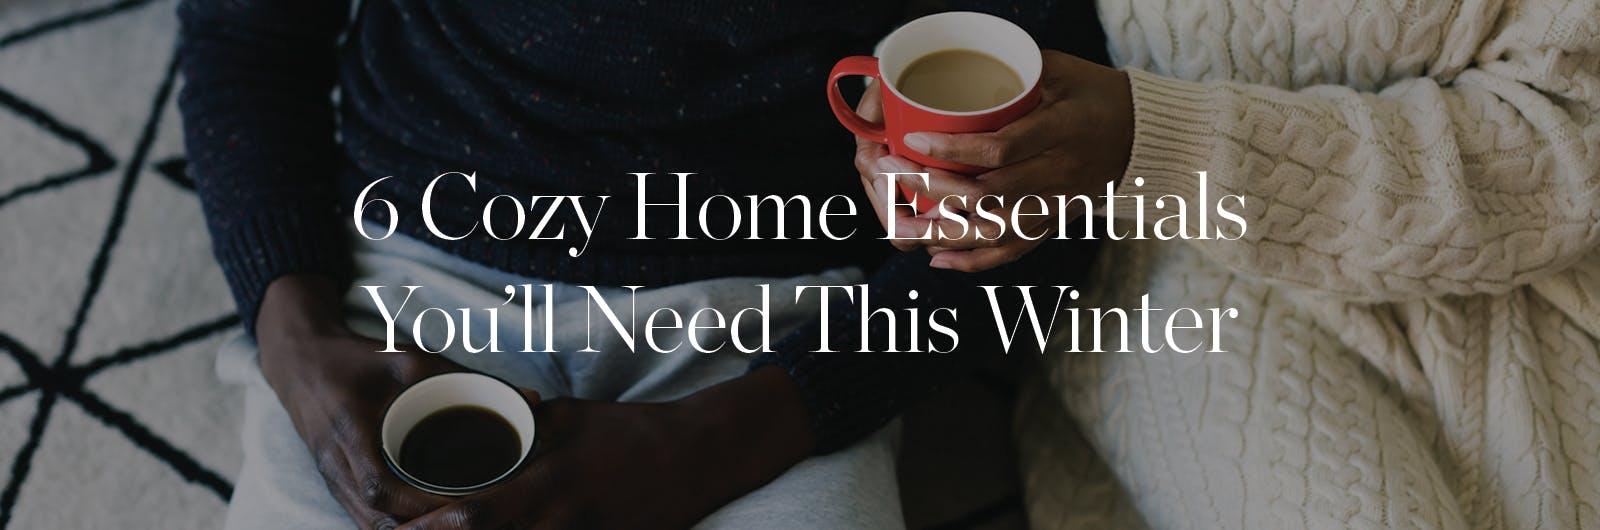 winter home essentials desktop